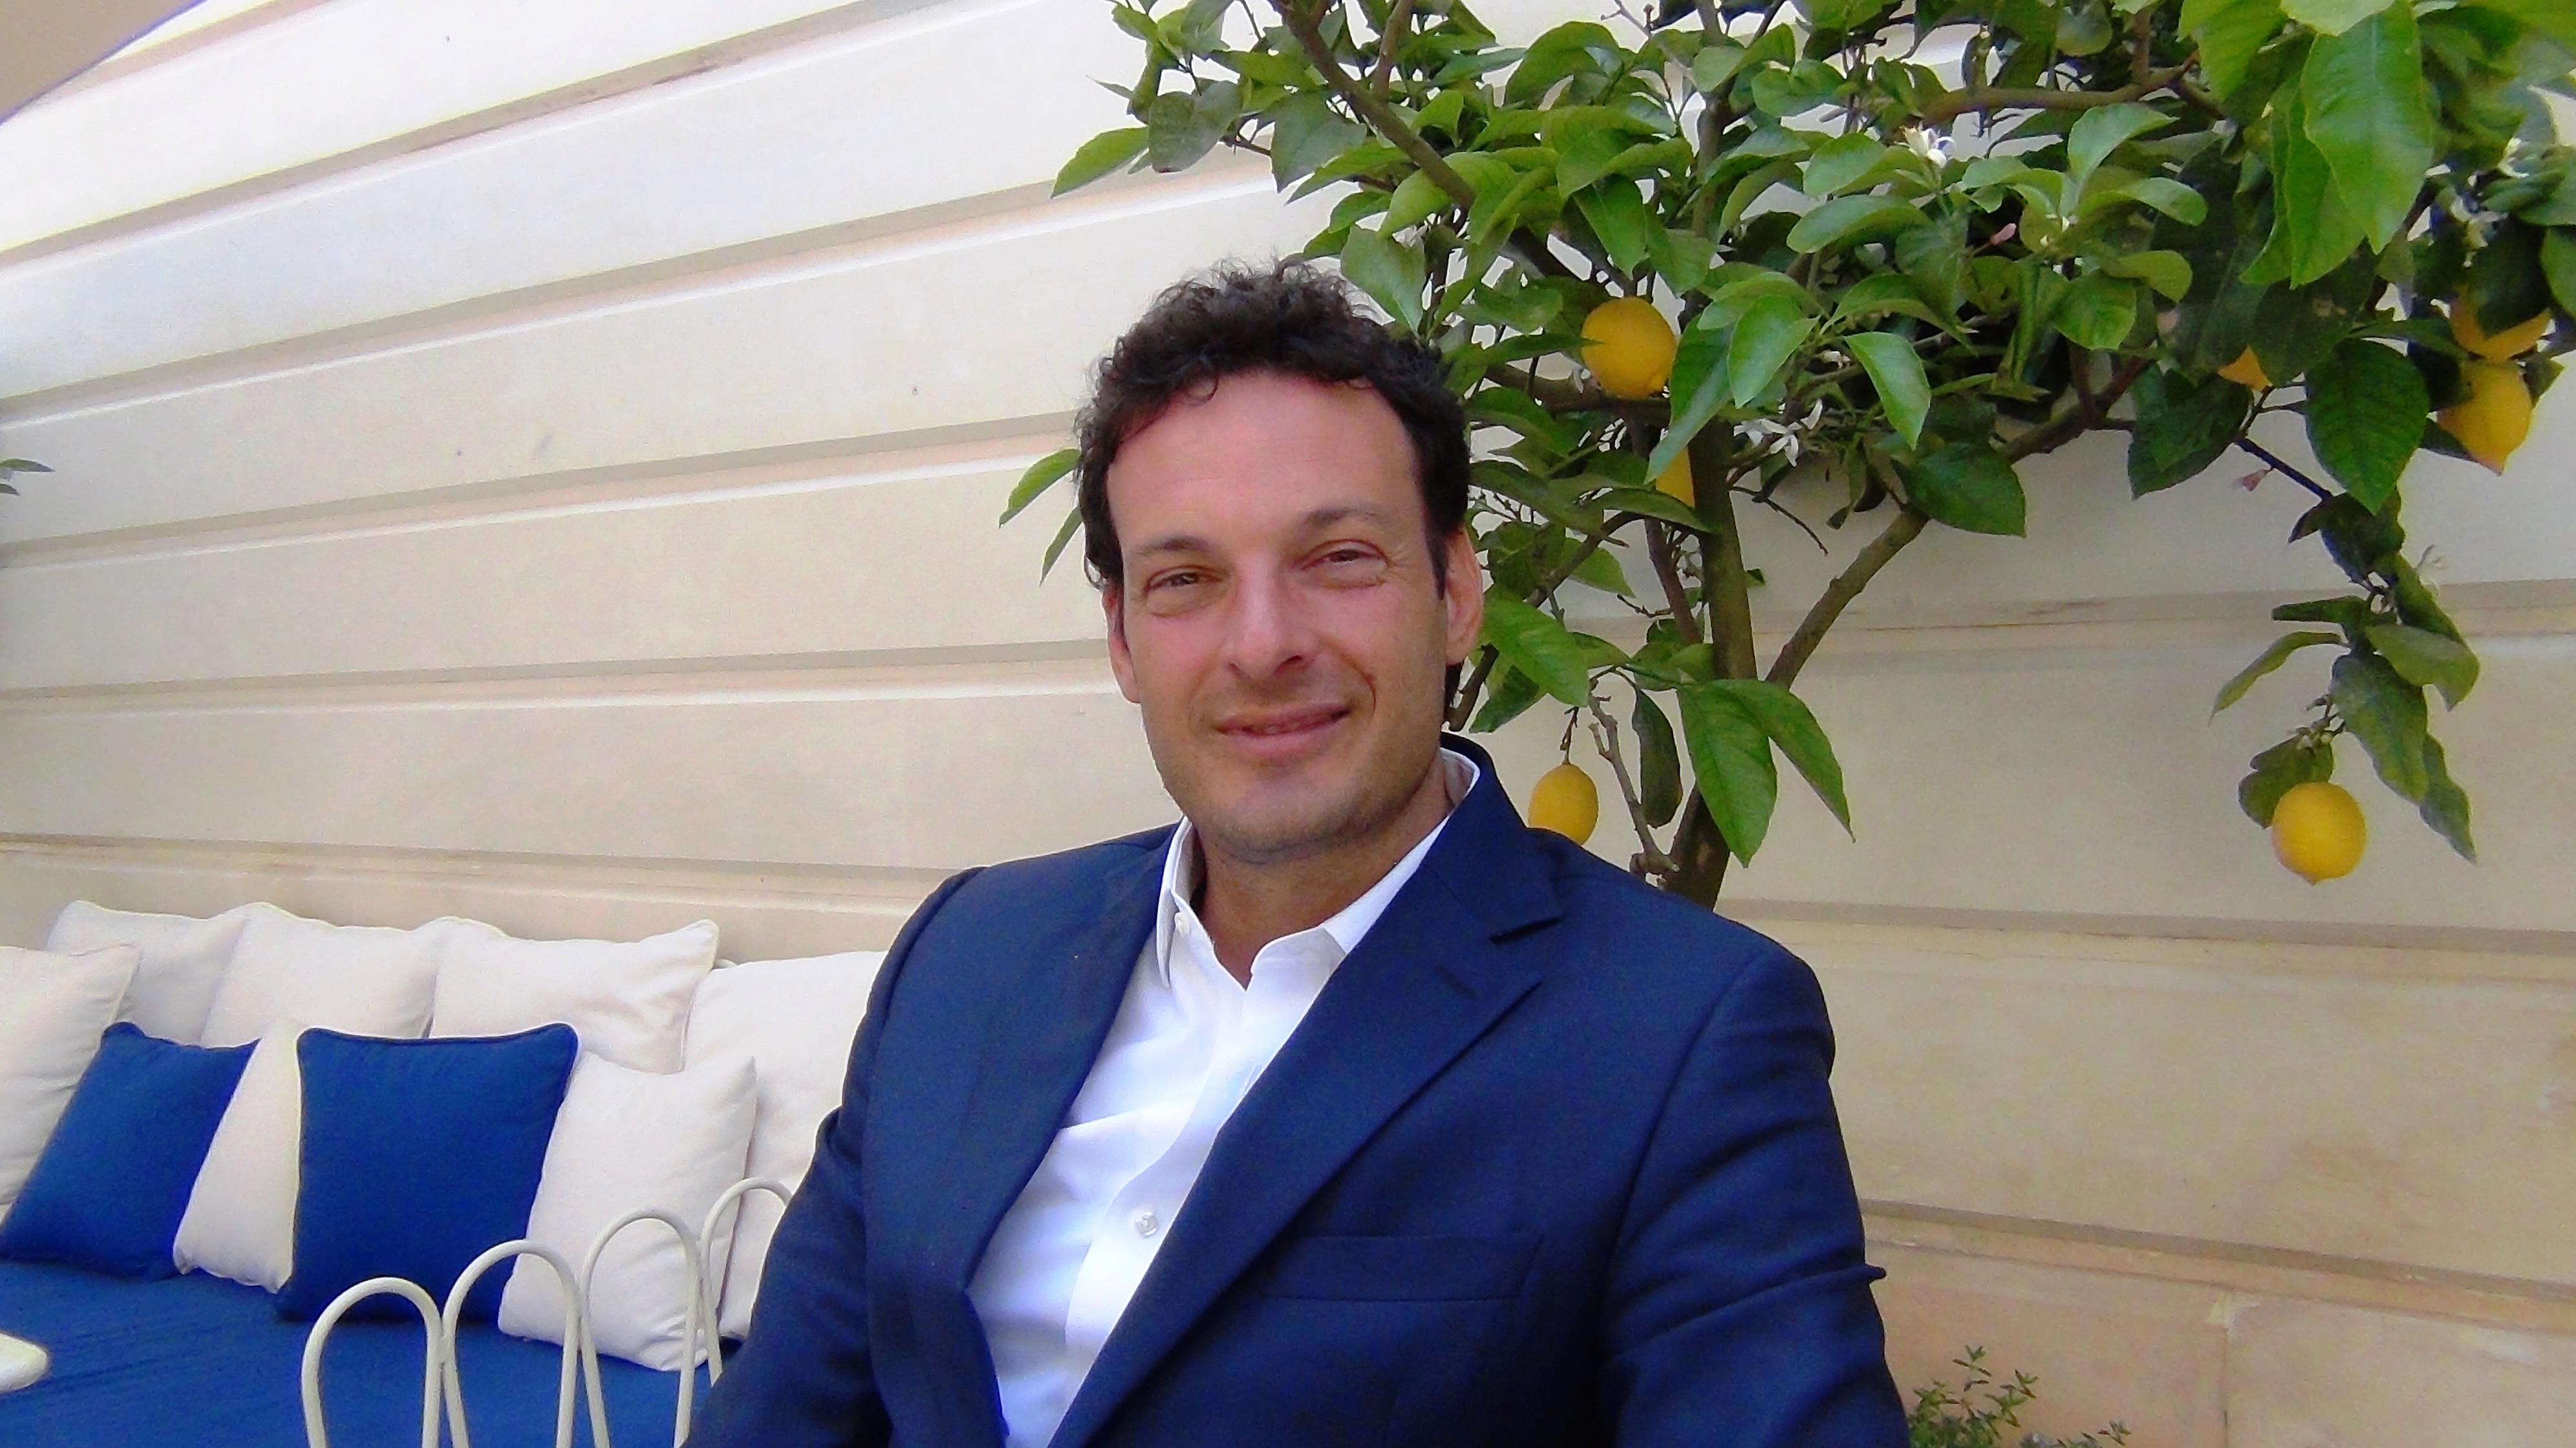 Italia corre per sindaco di Siracusa: